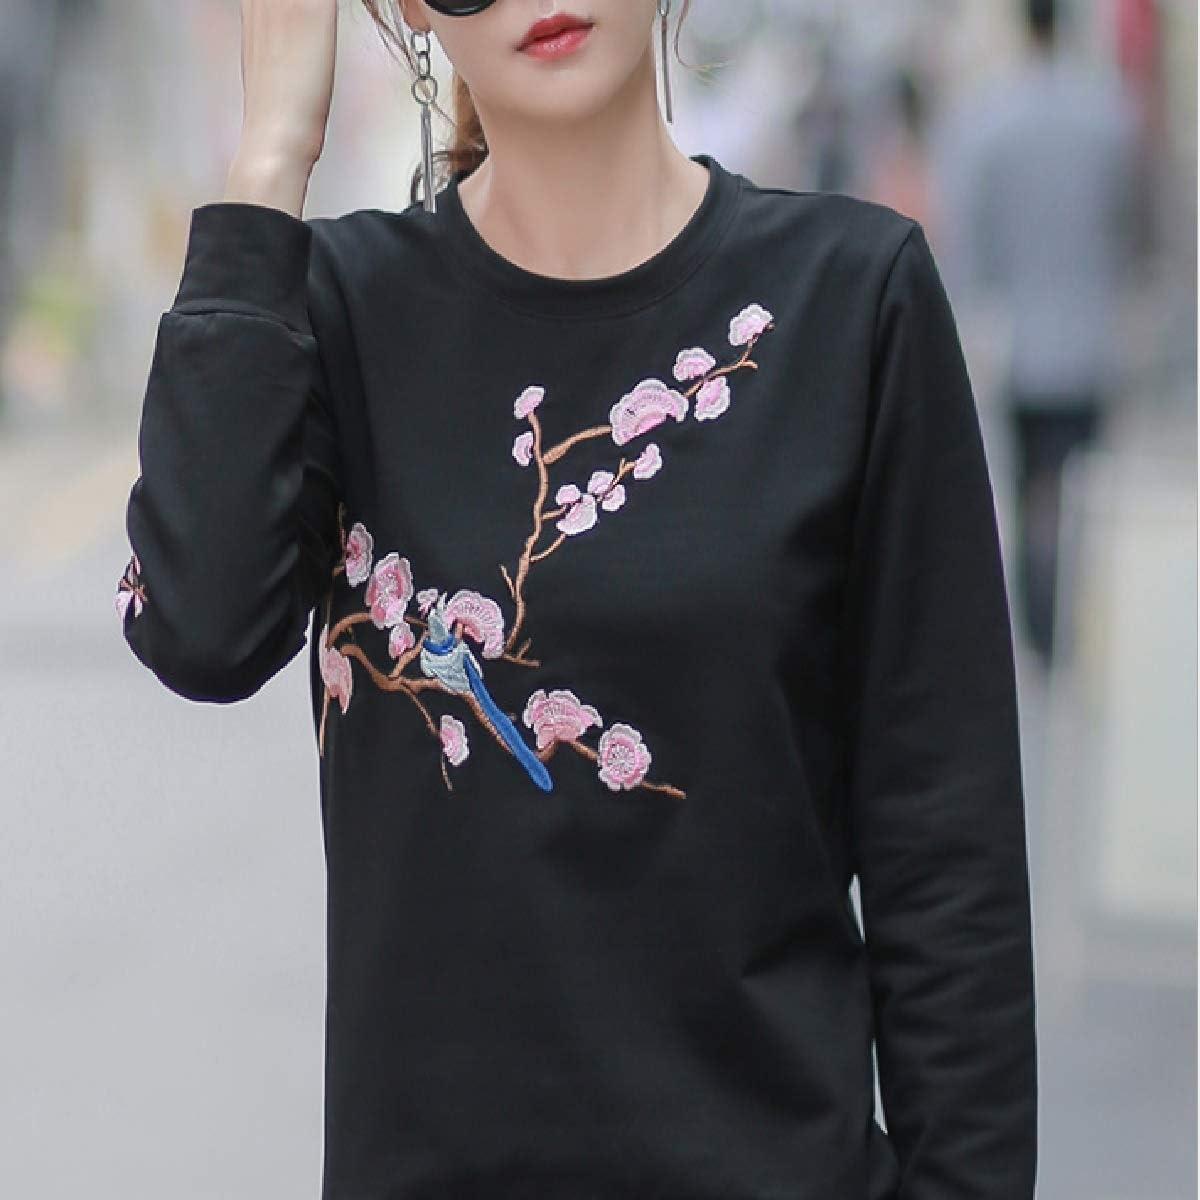 Butterfly BB Camiseta de manga larga de lana de cachemira versión coreana para mujer de principios de otoño suelta nueva camisa de base joker camisa de base de chaqueta joker,M